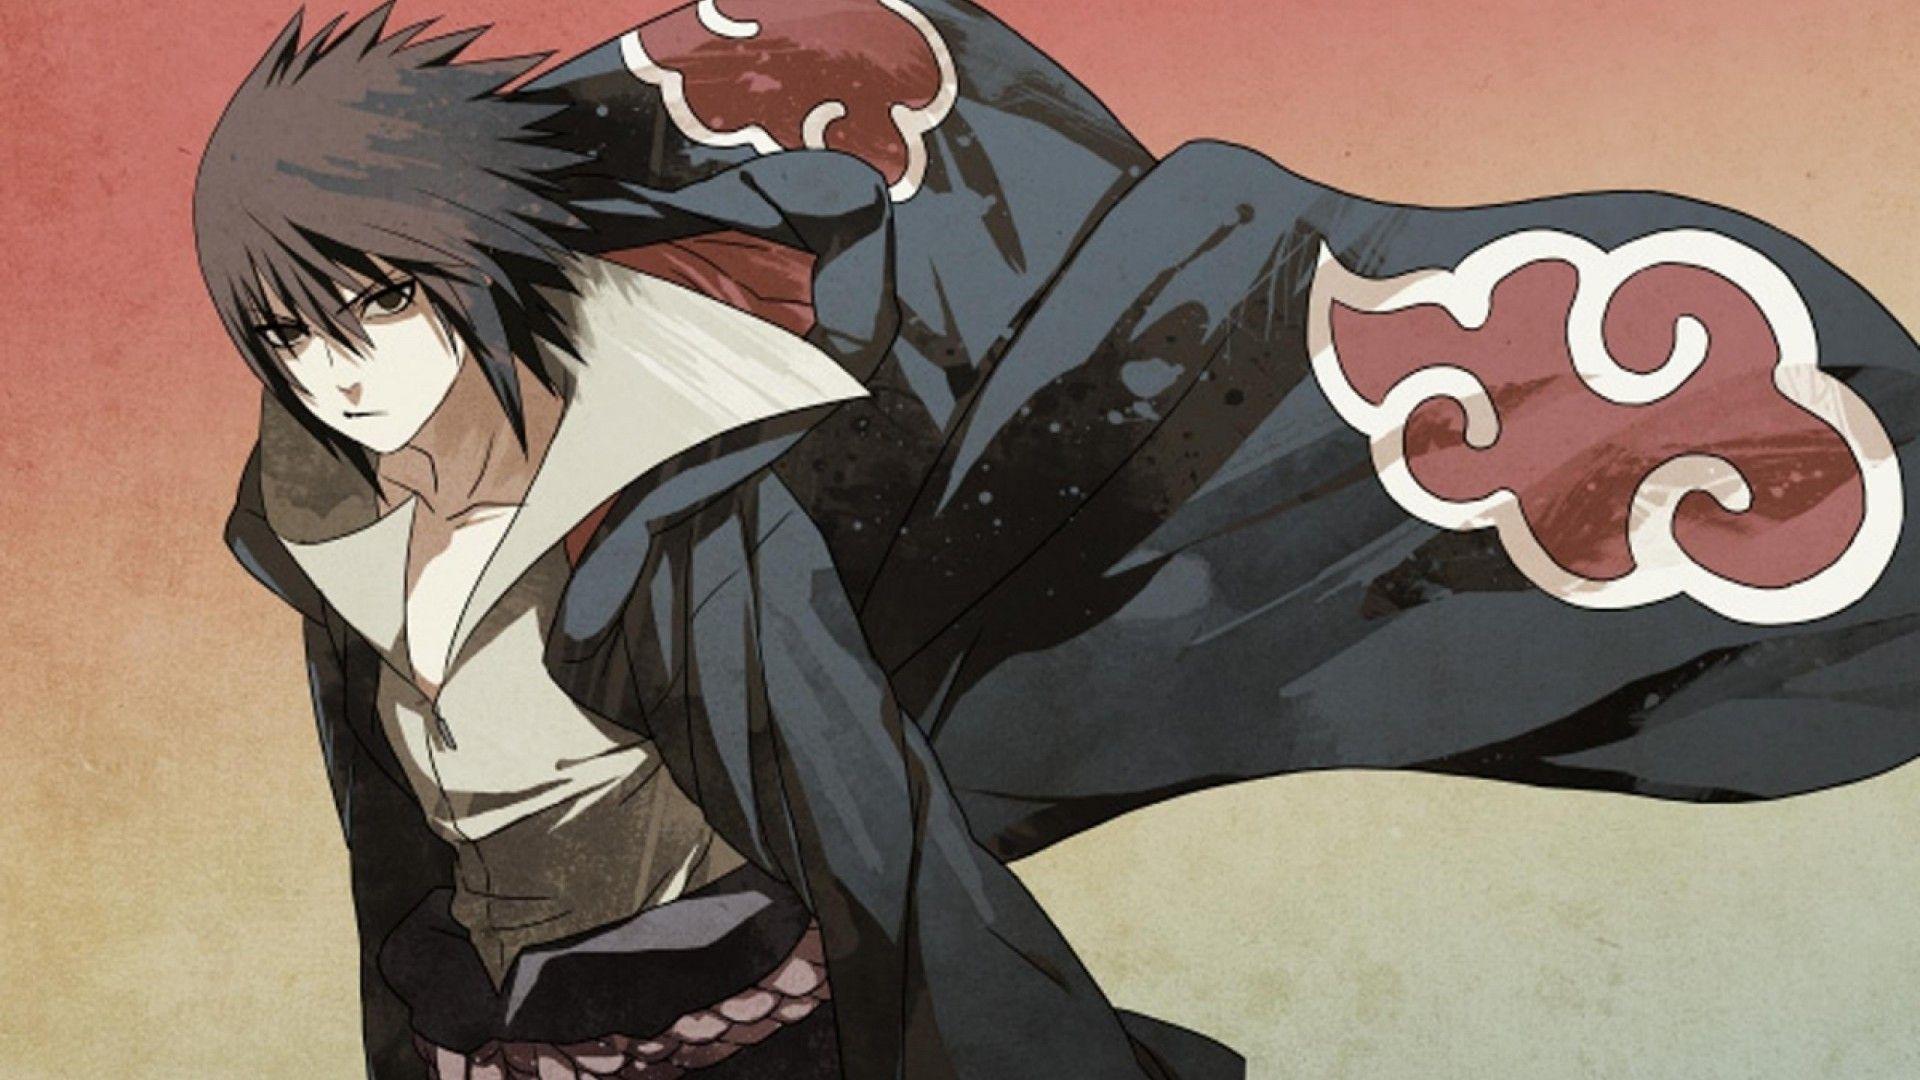 Naruto Shippuden Sasuke Wallpapers - Wallpaper Cave